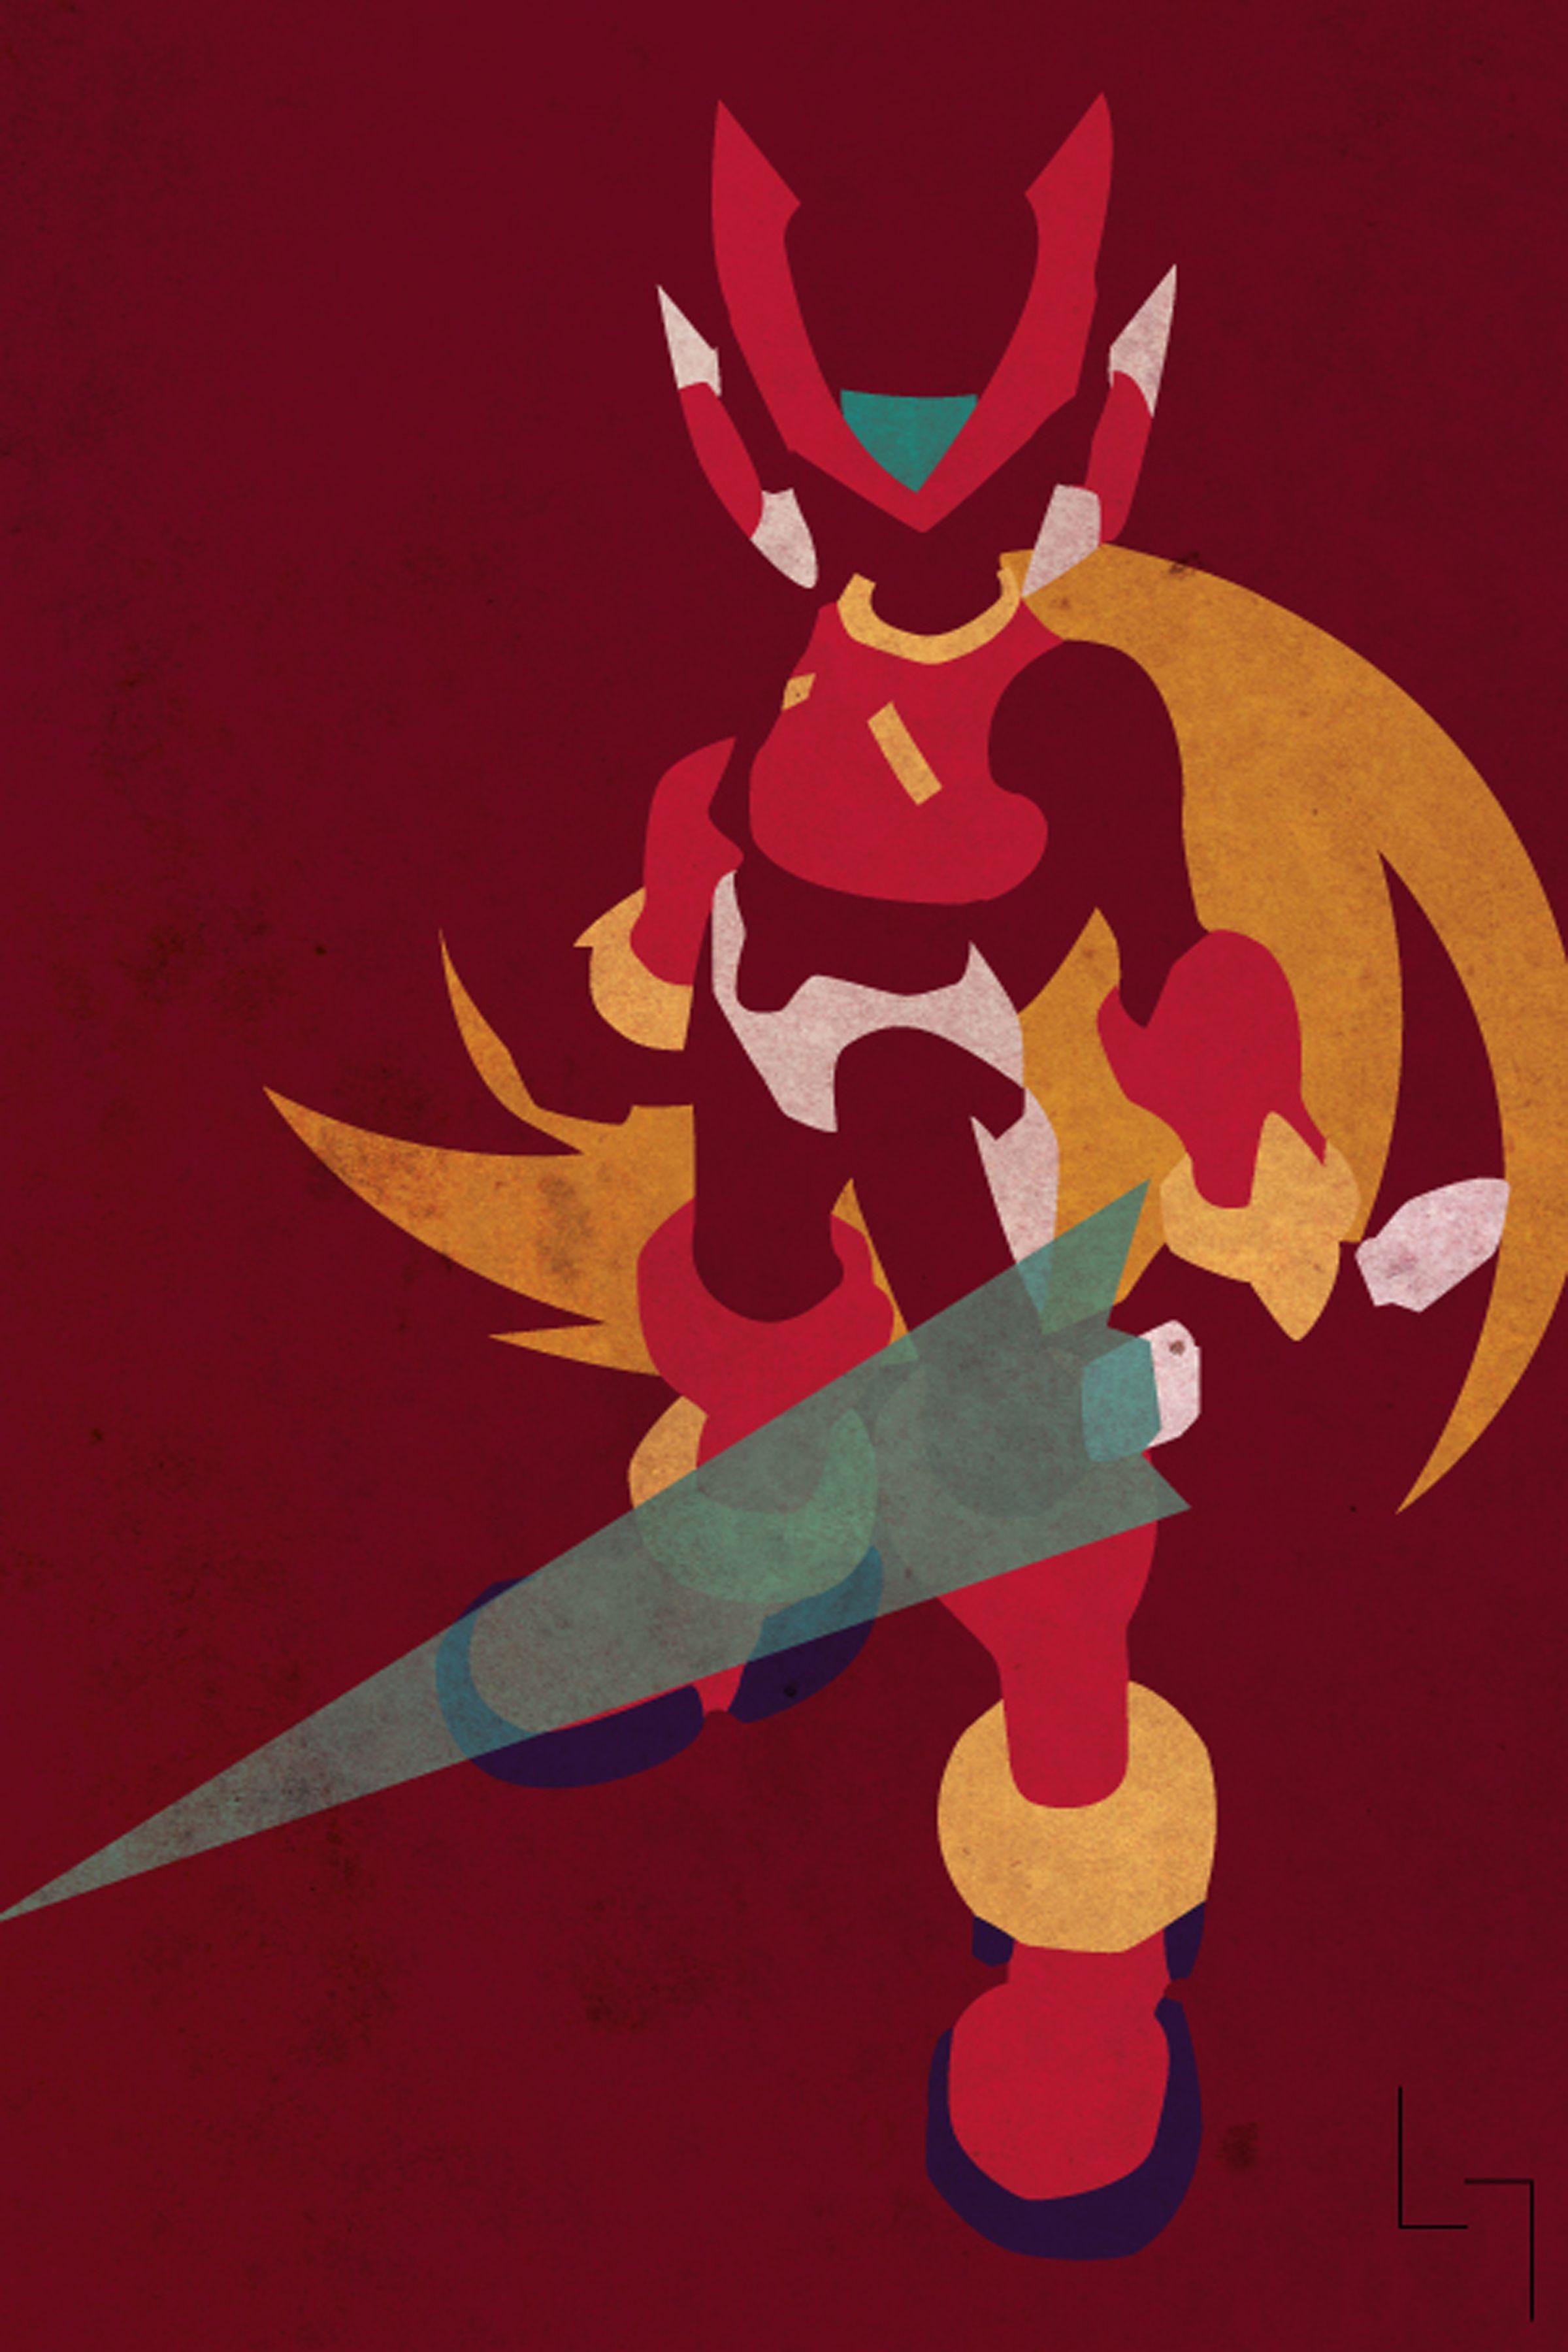 Zero, Megaman Zero | Weird, Awesome, or Just Plain Tunnerish